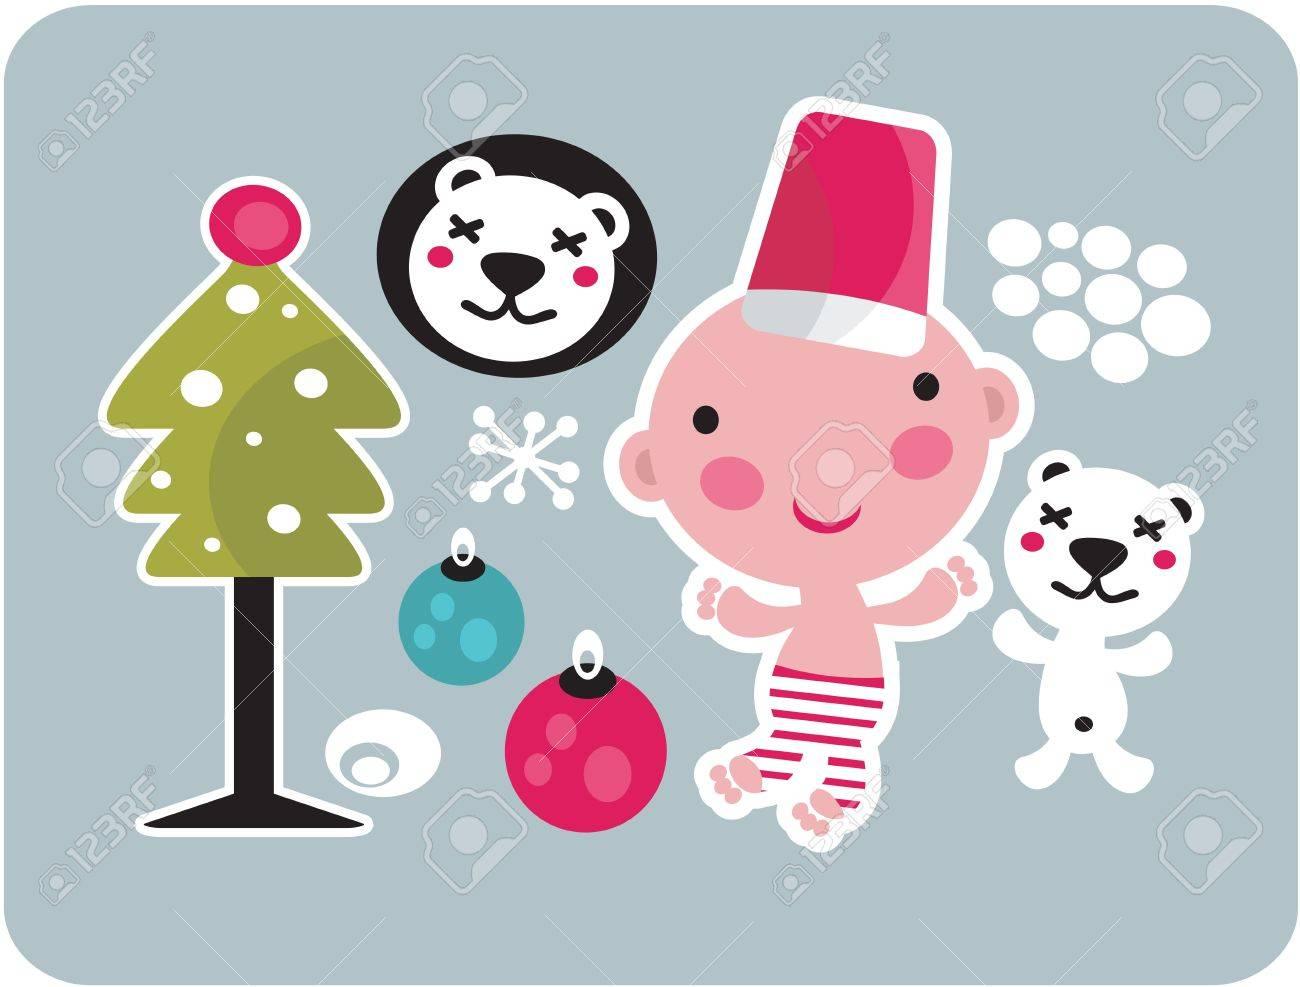 Christmas icons set. Vector illustration. Stock Vector - 11749459